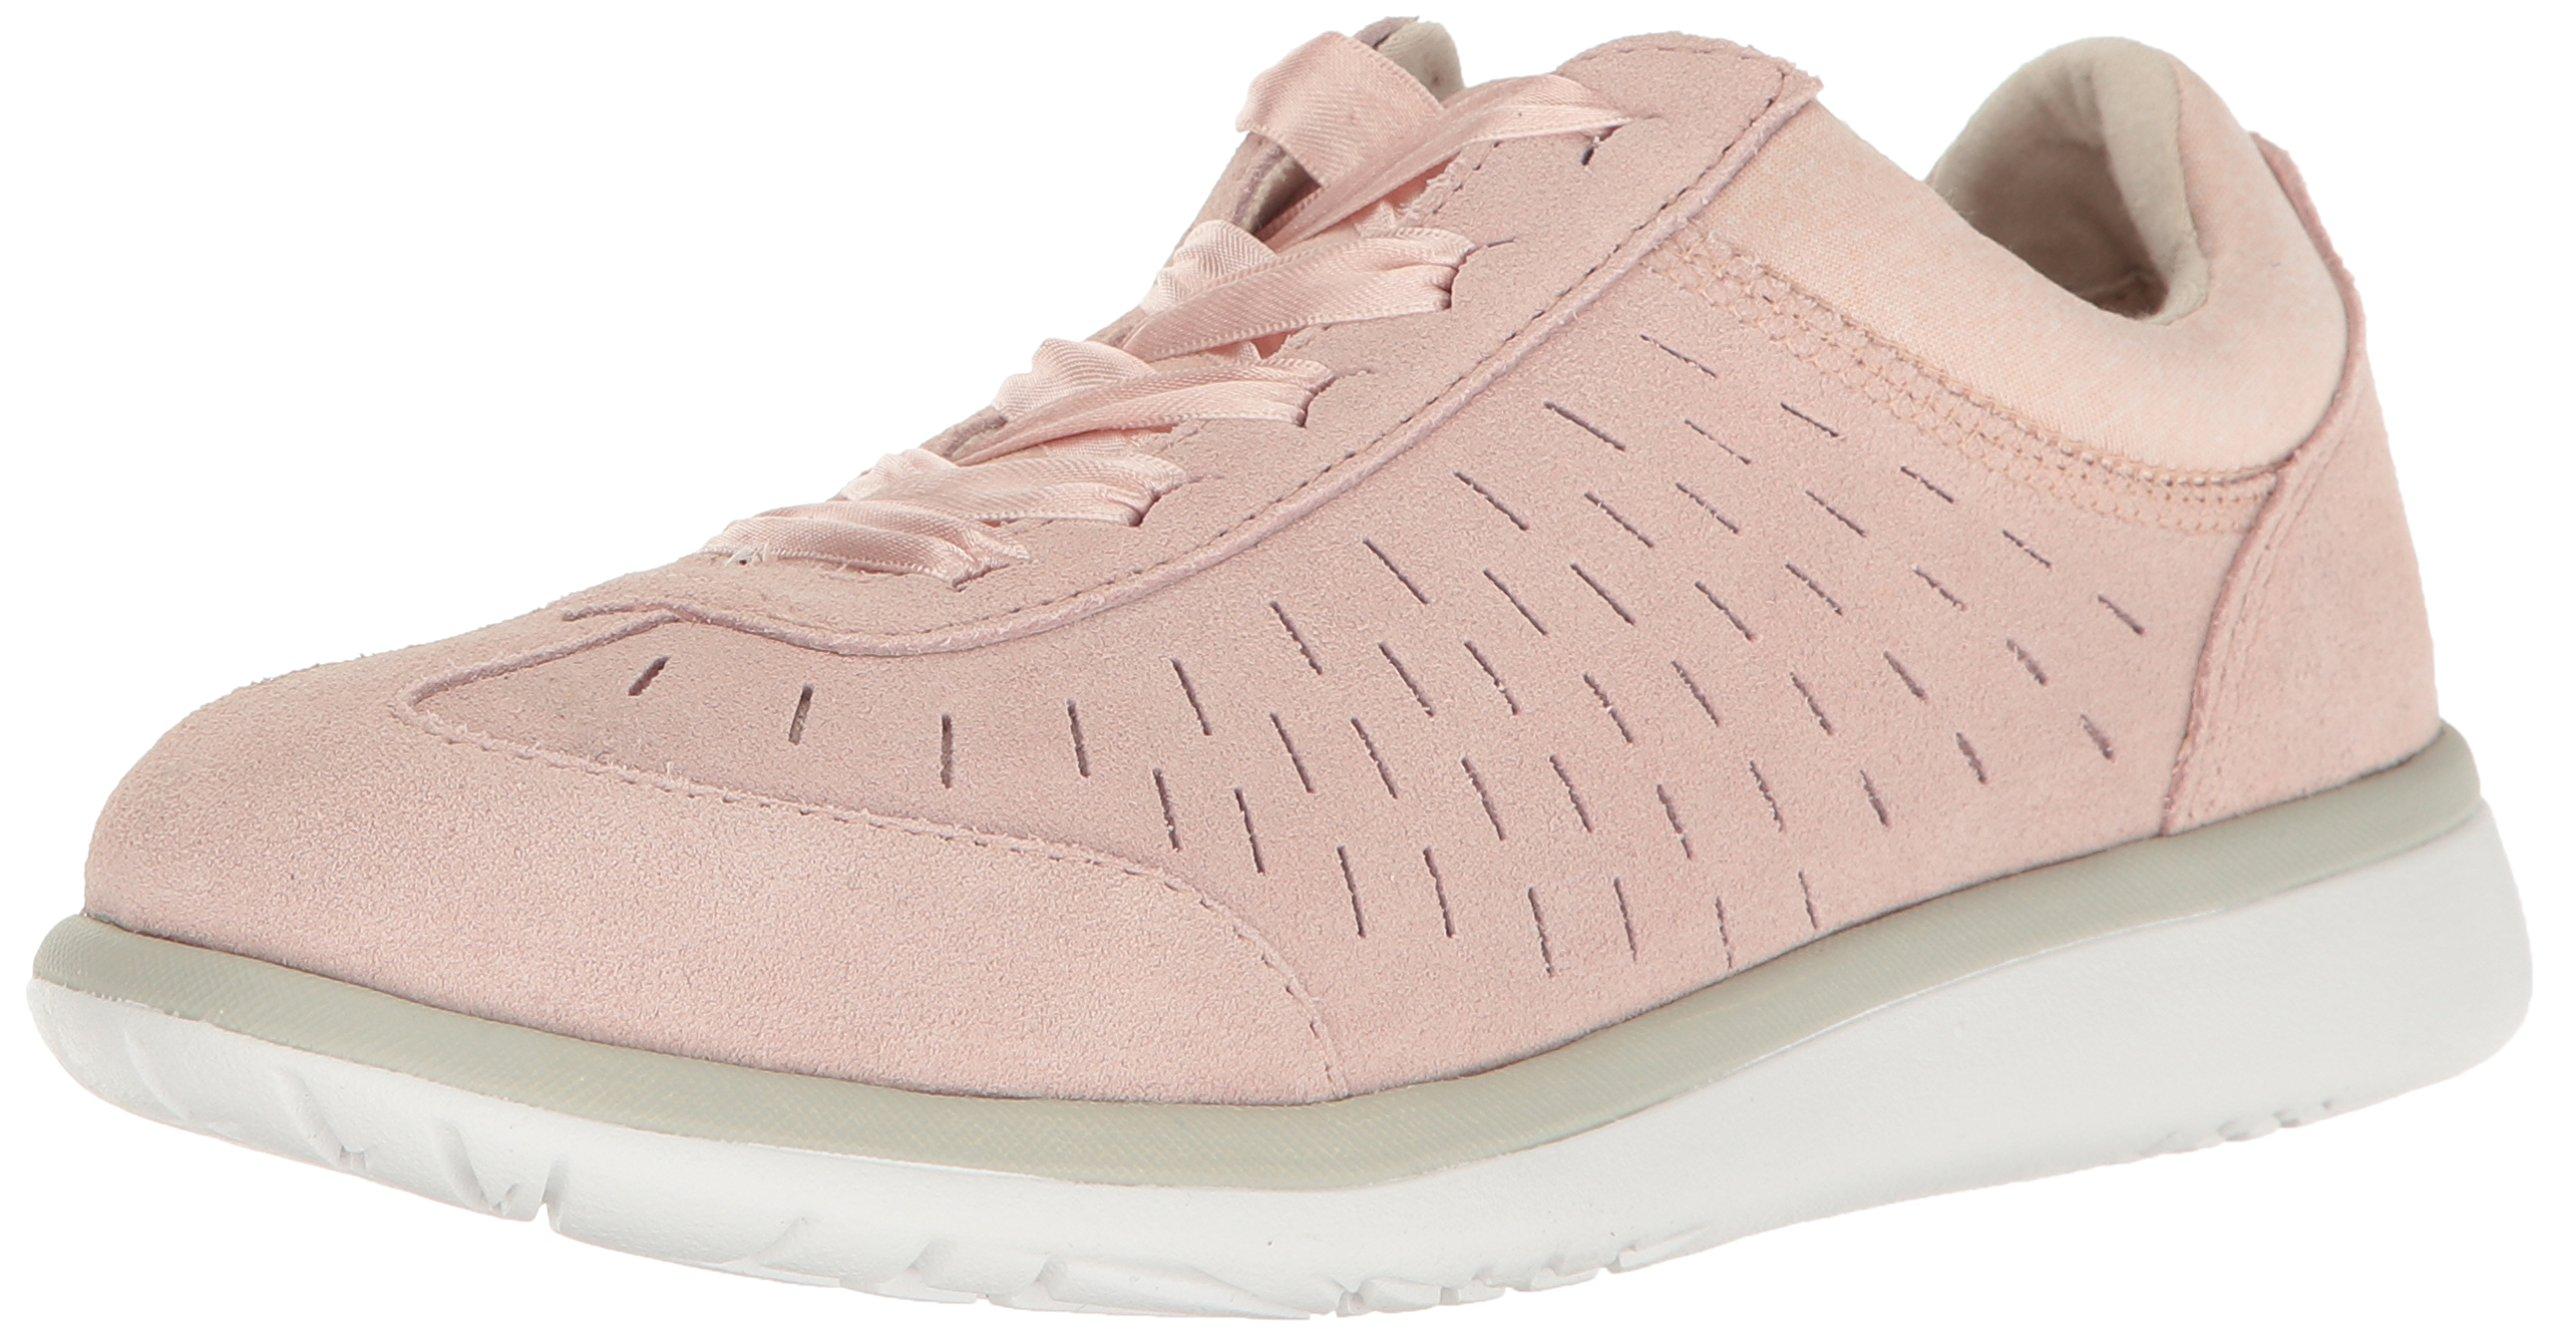 UGG Women's Victoria Fashion Sneaker, Quartz, 8 US/8 B US